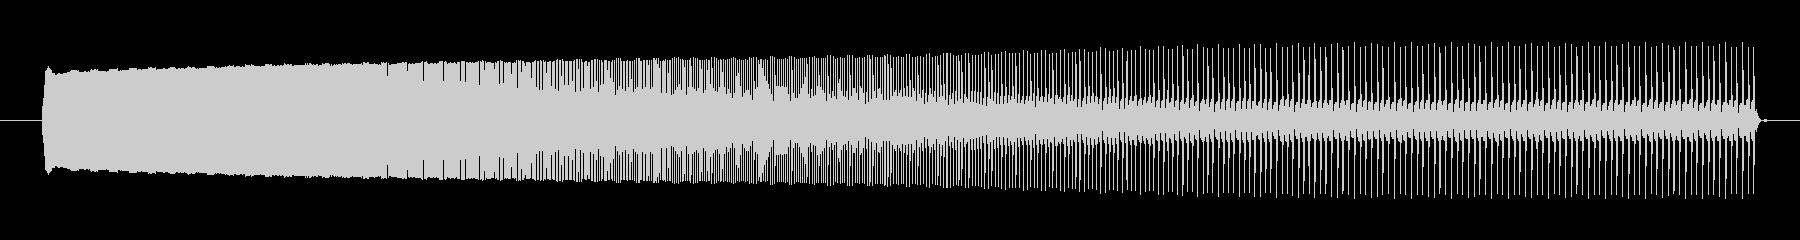 FX 合成信号03の未再生の波形